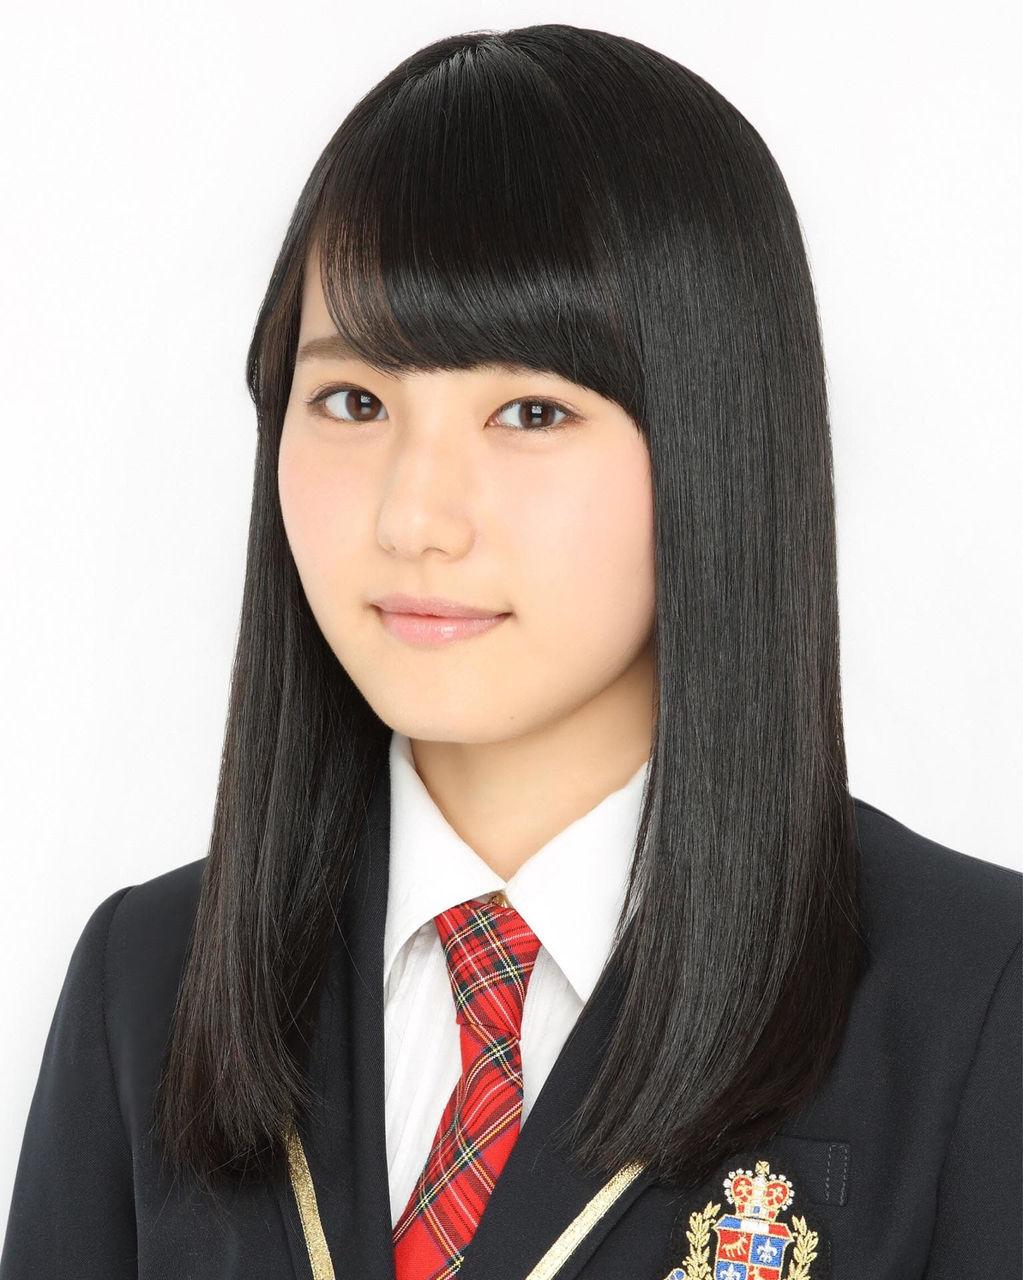 【AKB48 16期研究生】前田彩佳応援スレ★1【あやか】 ©2ch.net